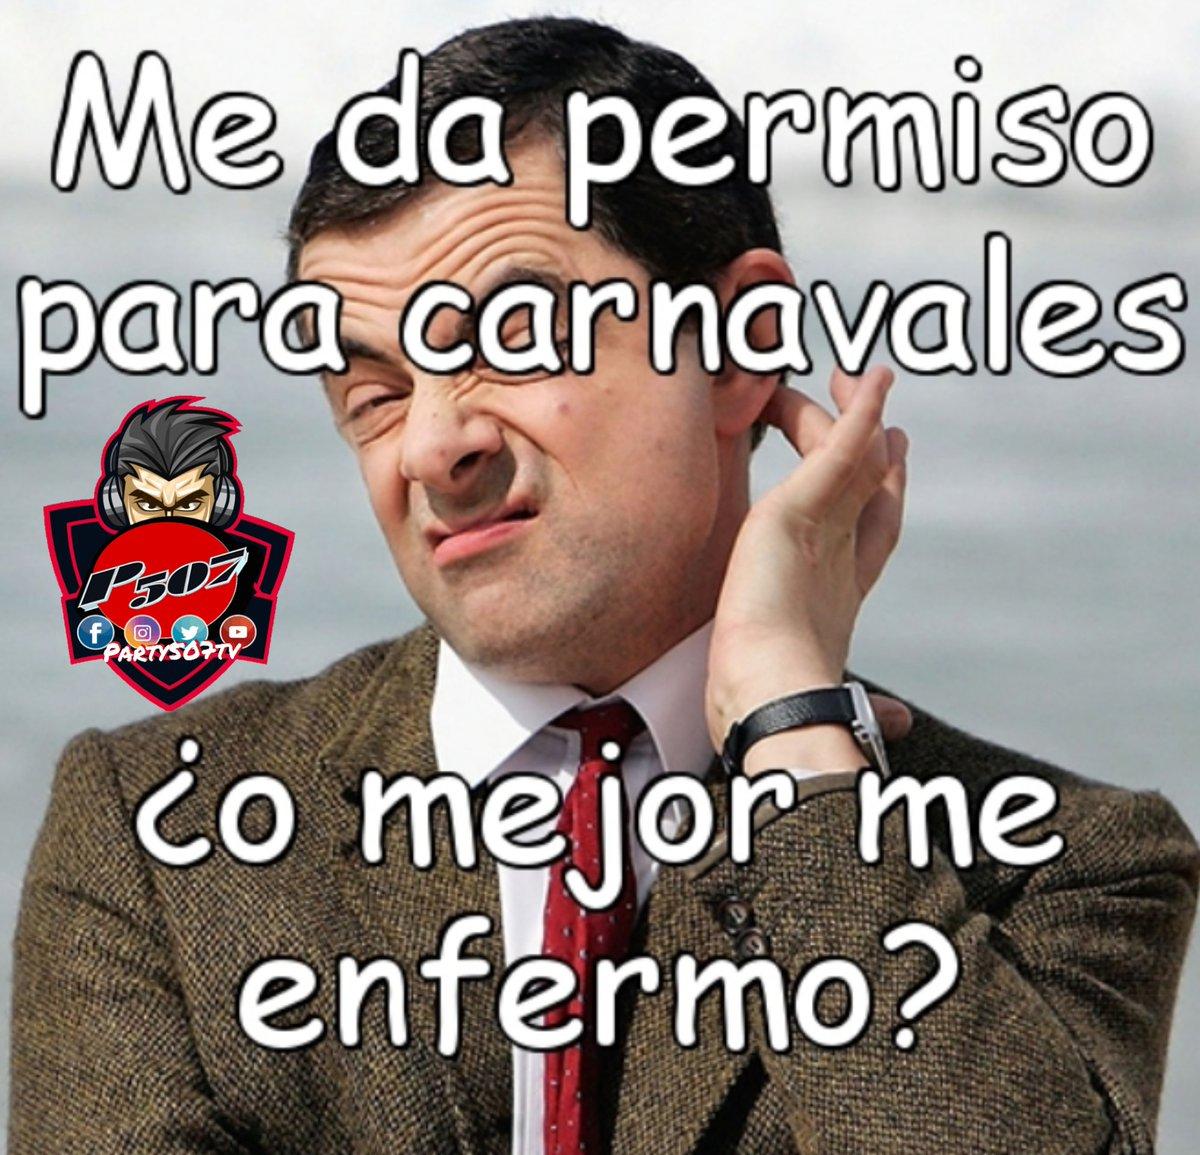 #party507tv #memes #humor #humornegro #humoramarillo #humorista #humorgrafico #risa #risas #videosderisas #videosgraciosos #videoviral #risasaseguradas #risascontagiosas #risasymasrisas #graciosopic.twitter.com/olVdSGphqp